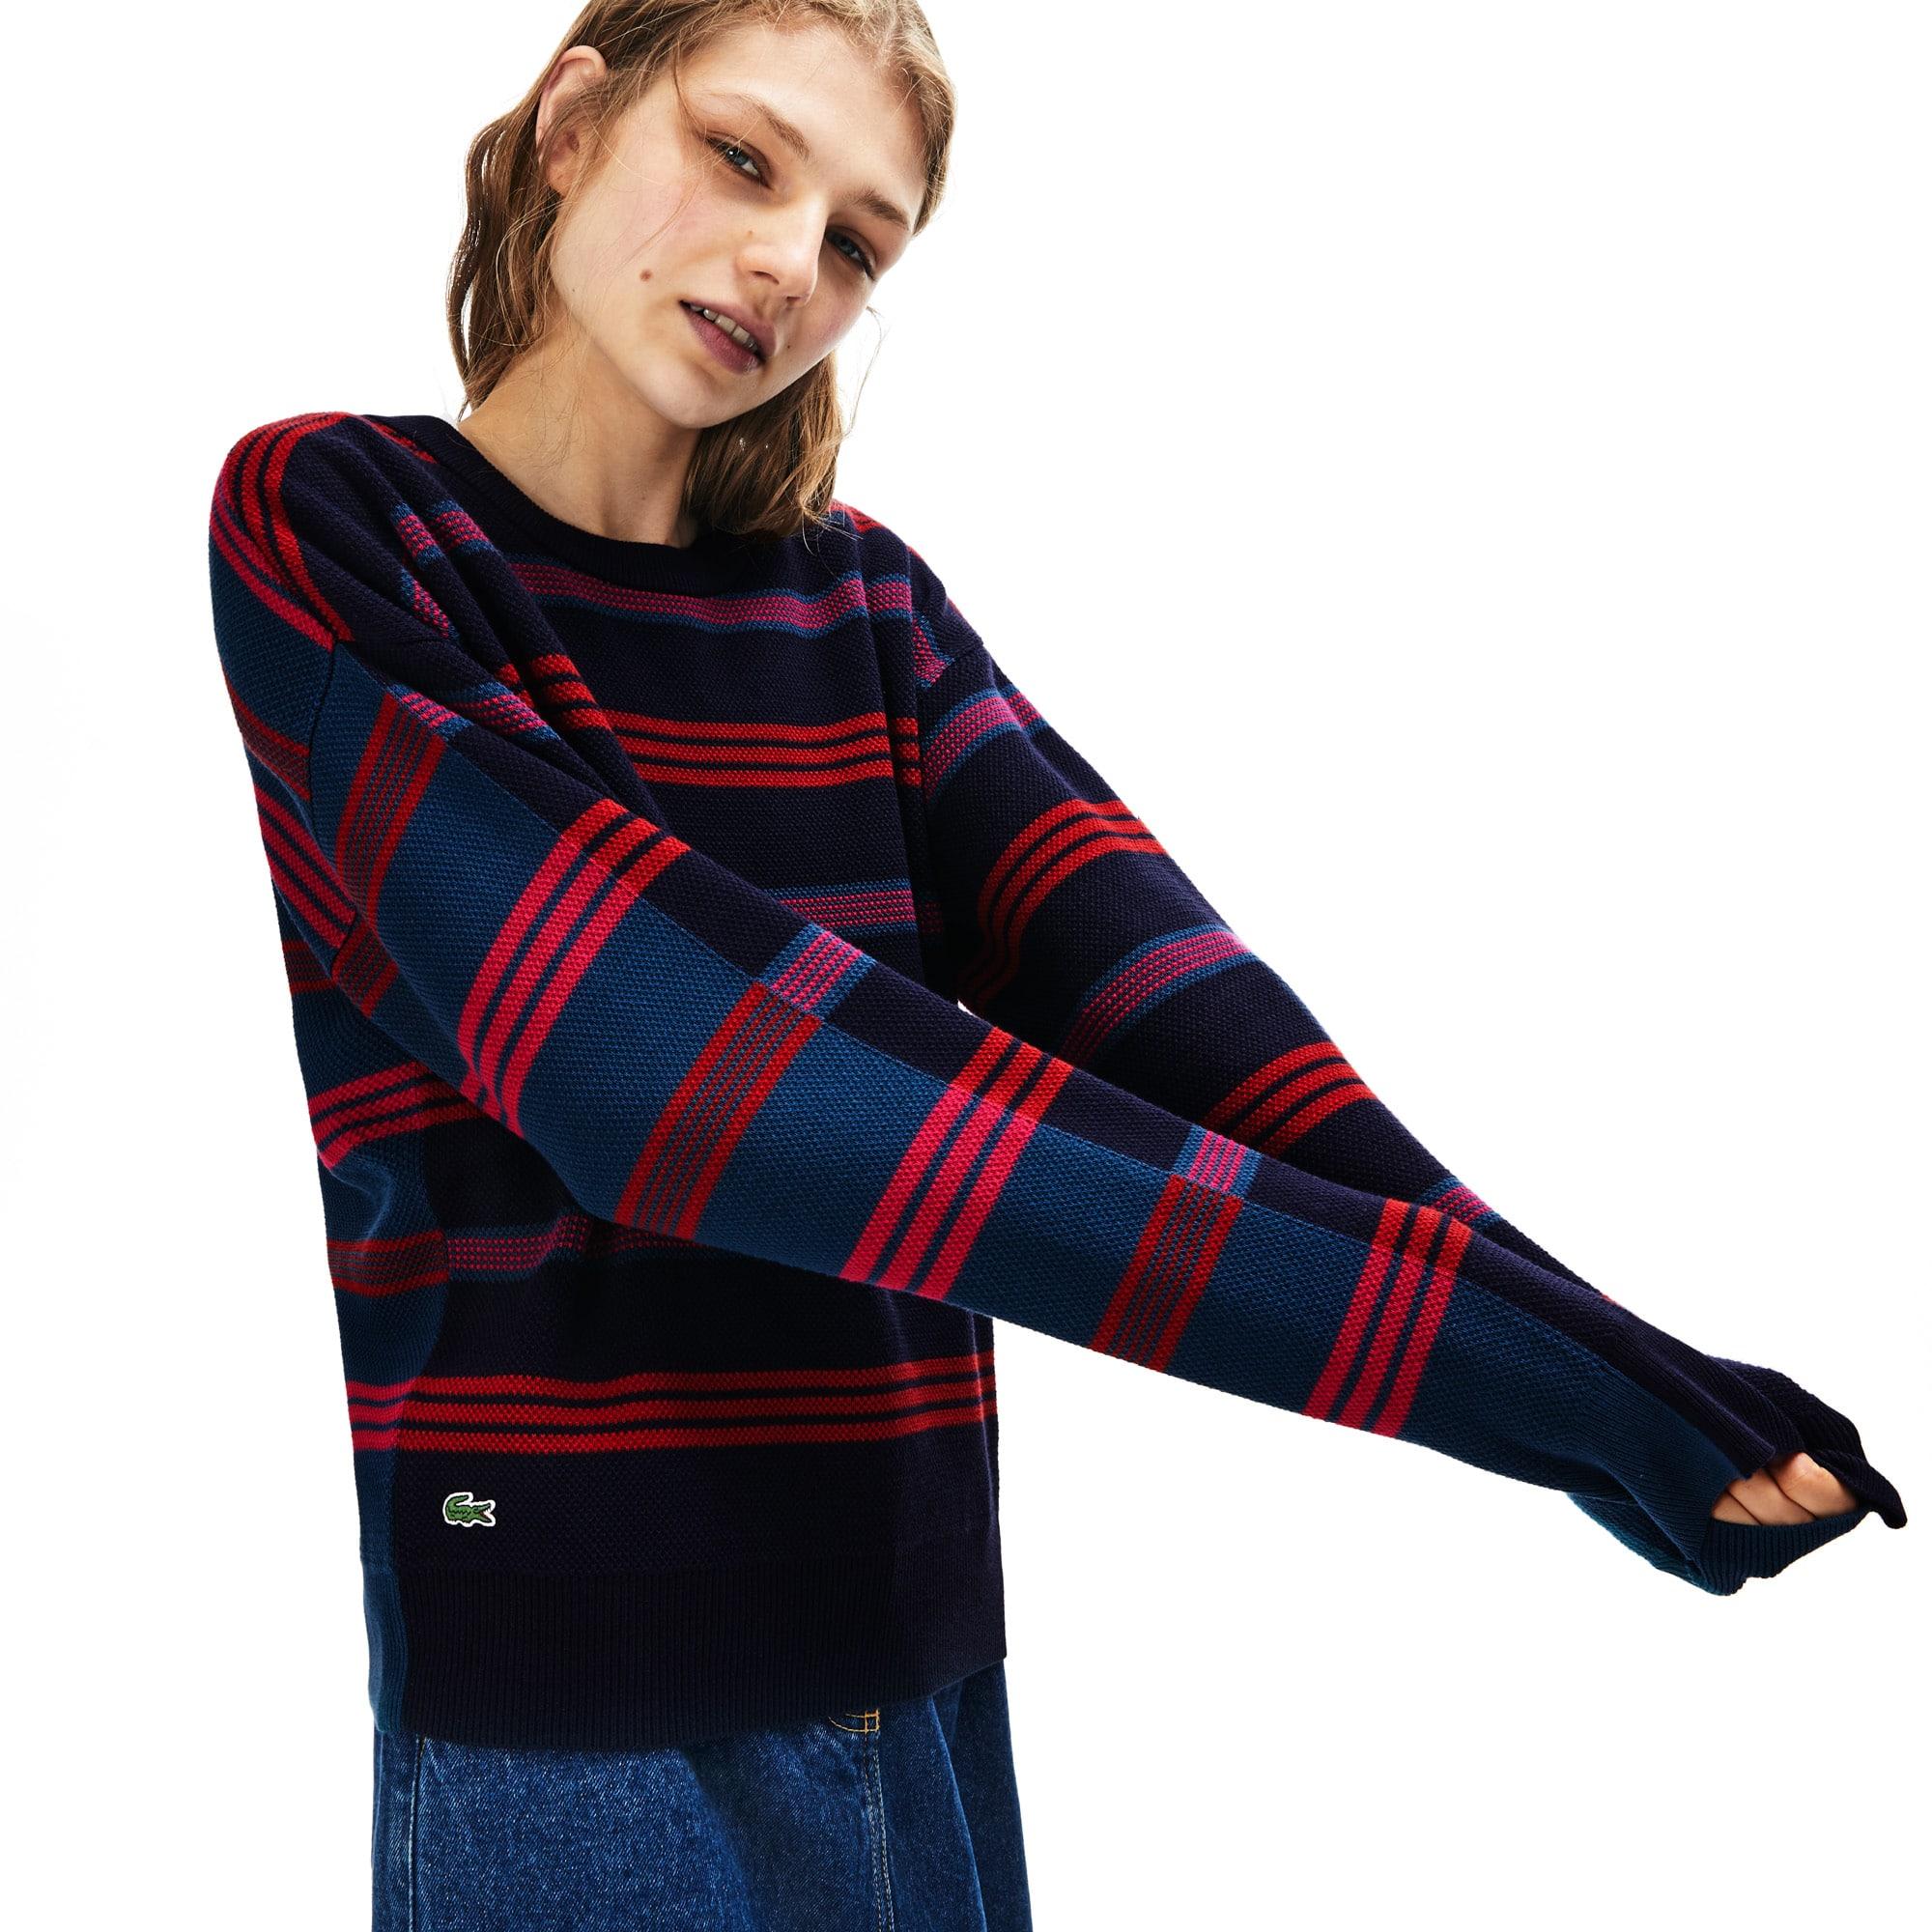 wholesale dealer 789b3 7fdfc Polos, Kleidung und Lederwaren Online | LACOSTE